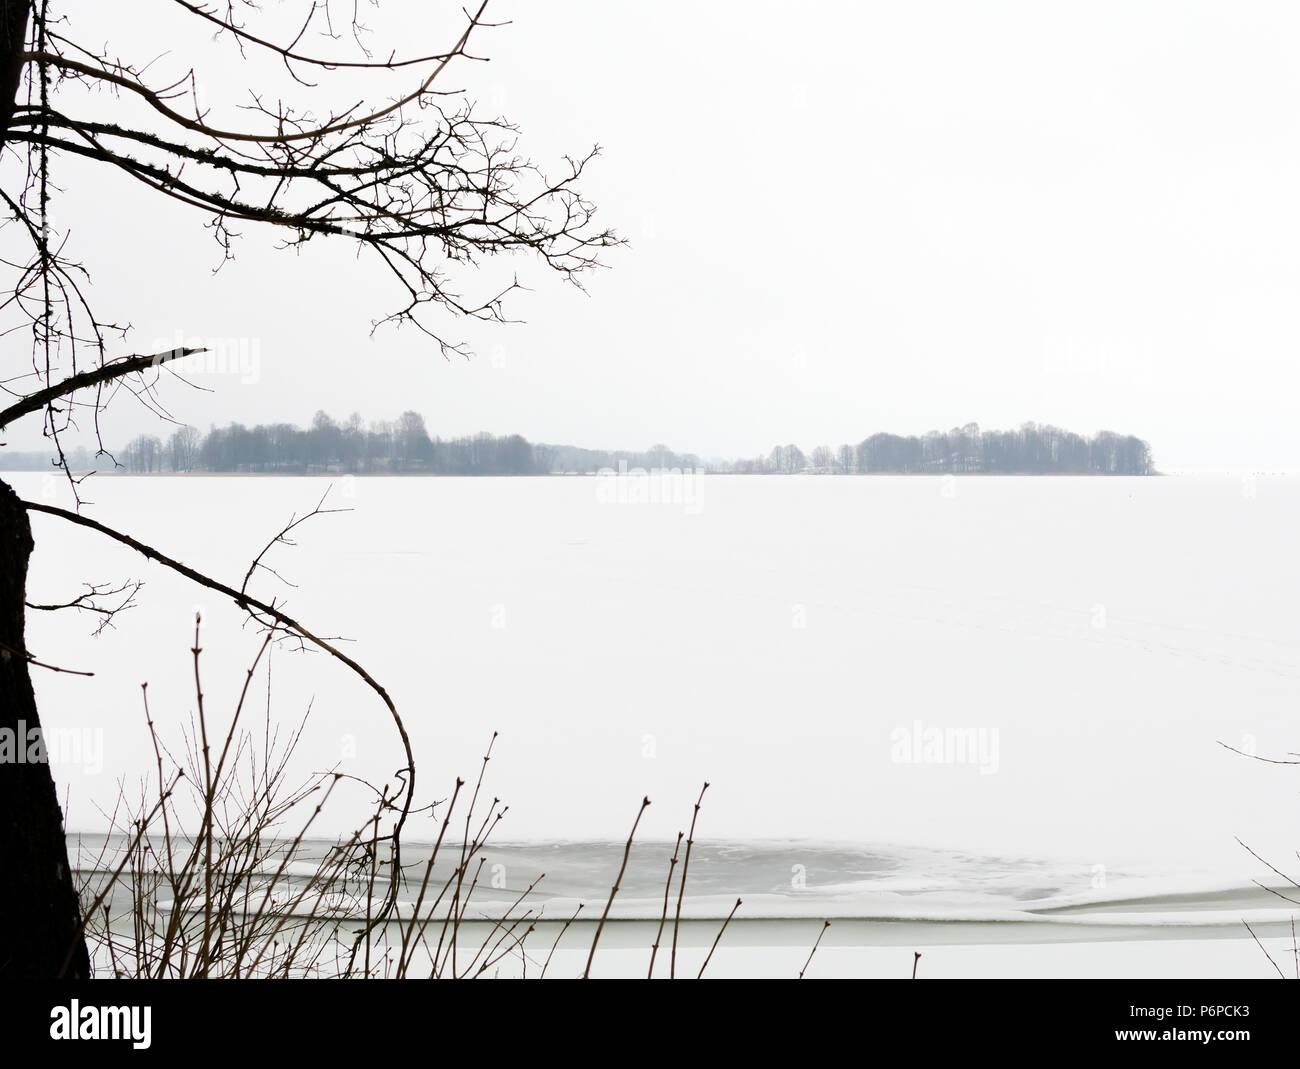 Minimalistic tranquil landscape  Natural background